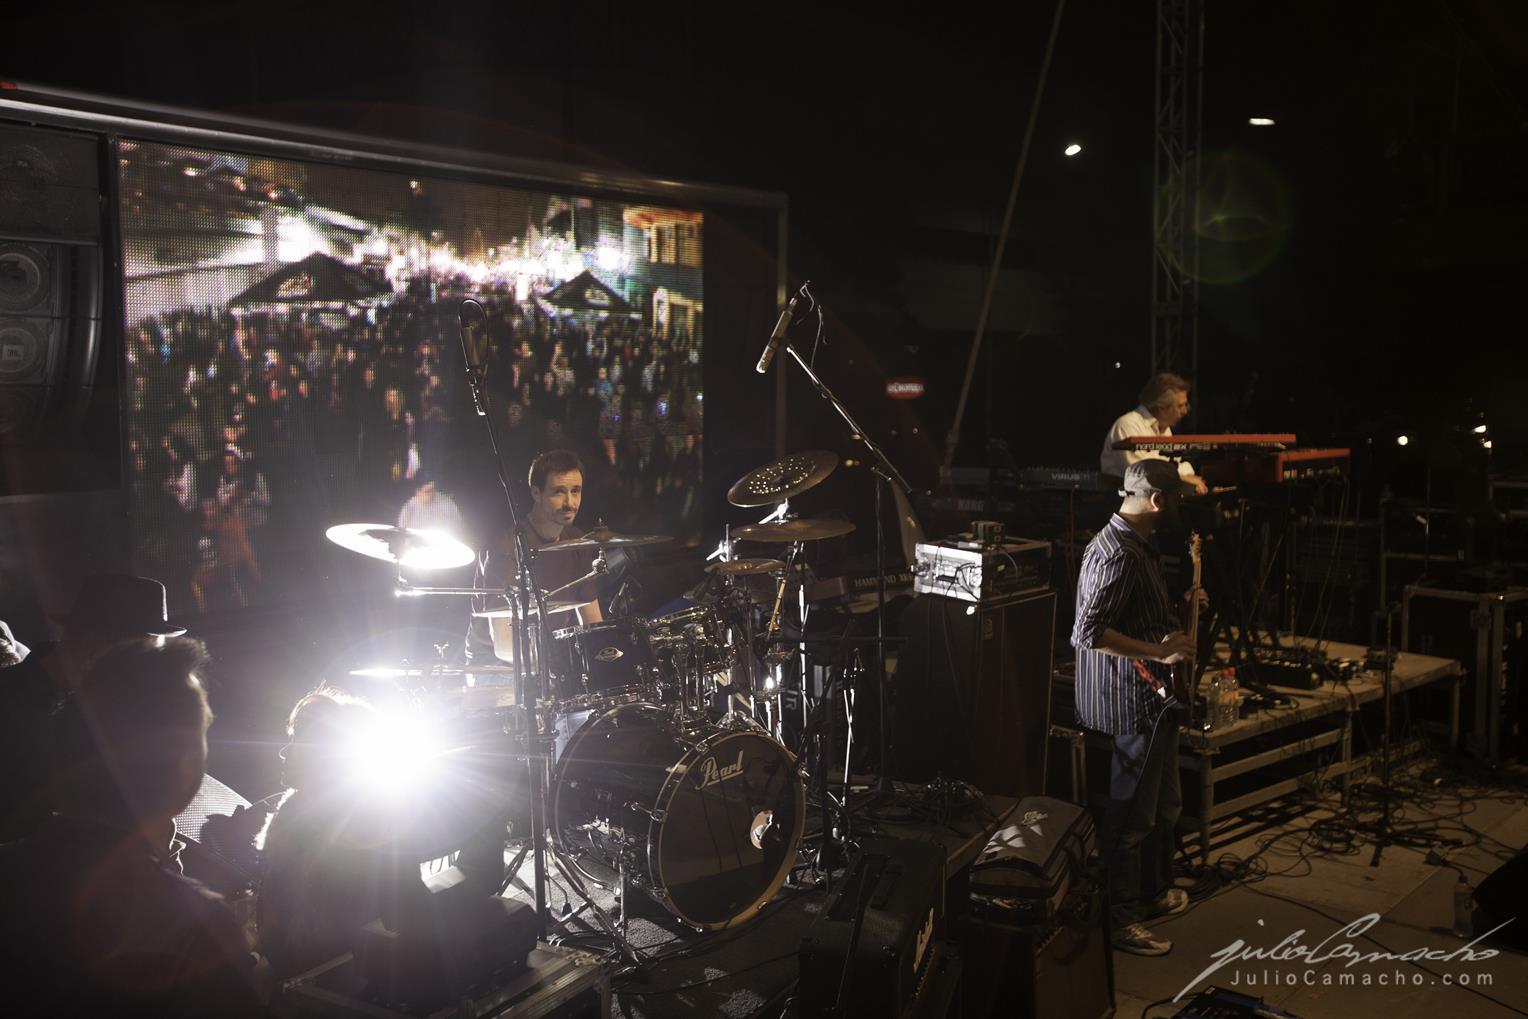 2014-10-30 31 CAST TOUR Ensenada y Tijuana - 1371 - www.Juli (Copy).jpg